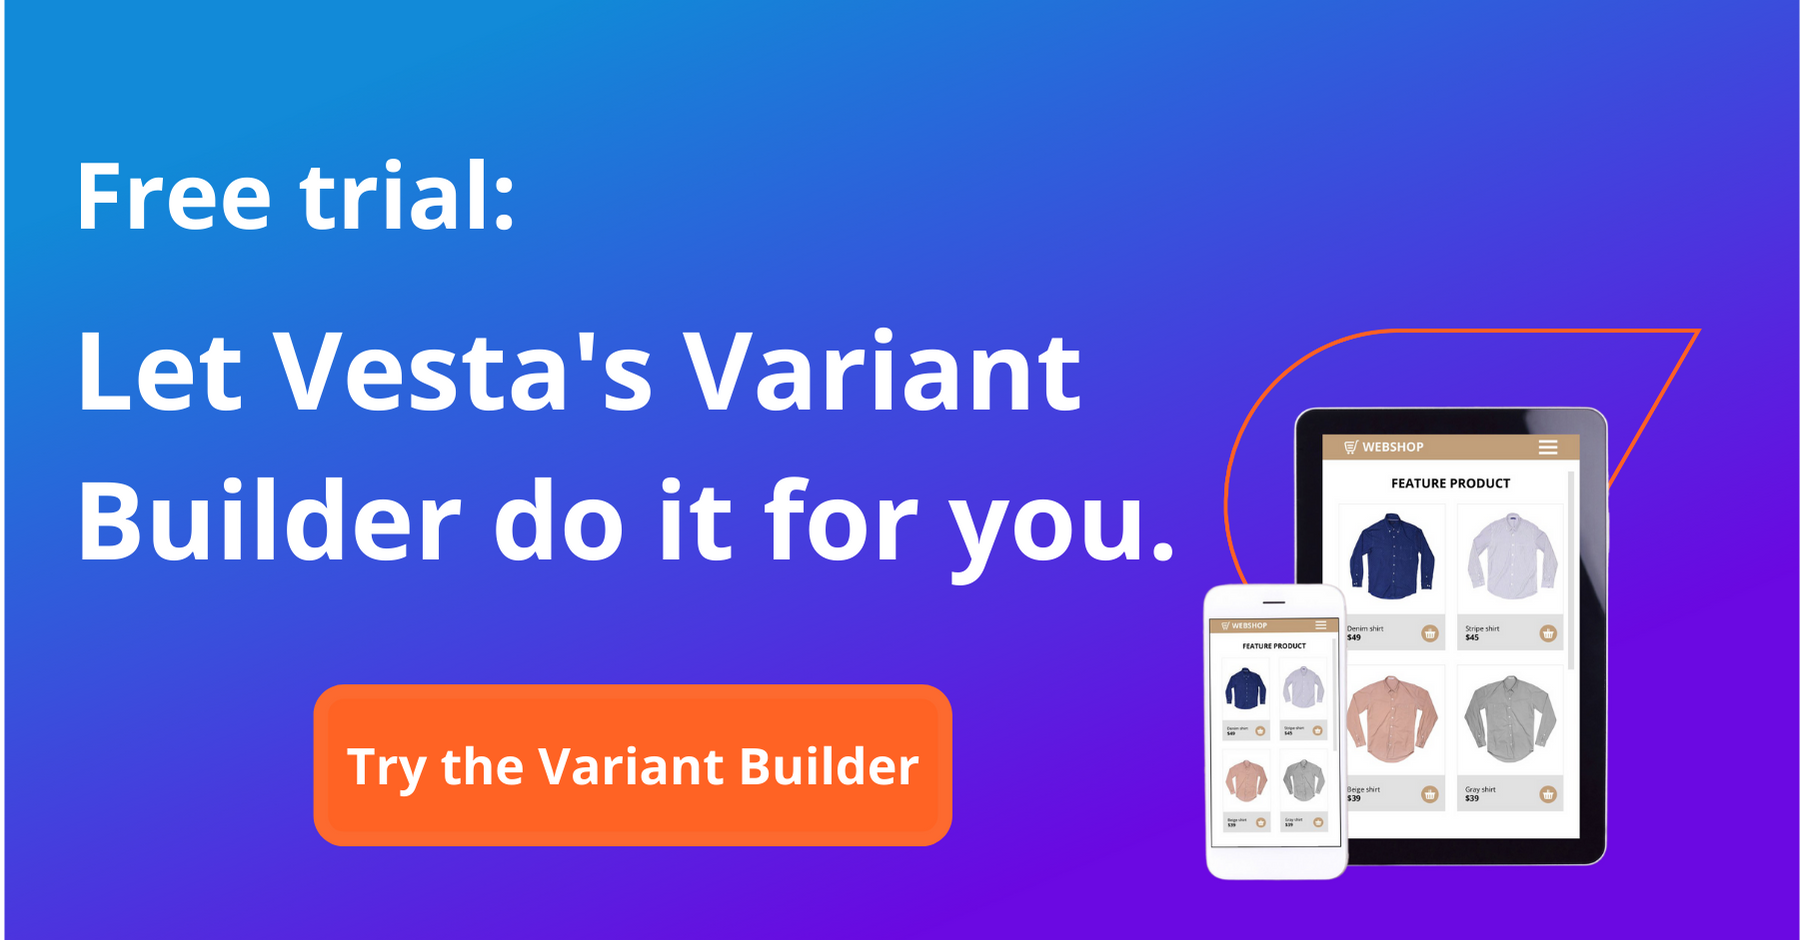 Vesta Variant Builder Trial